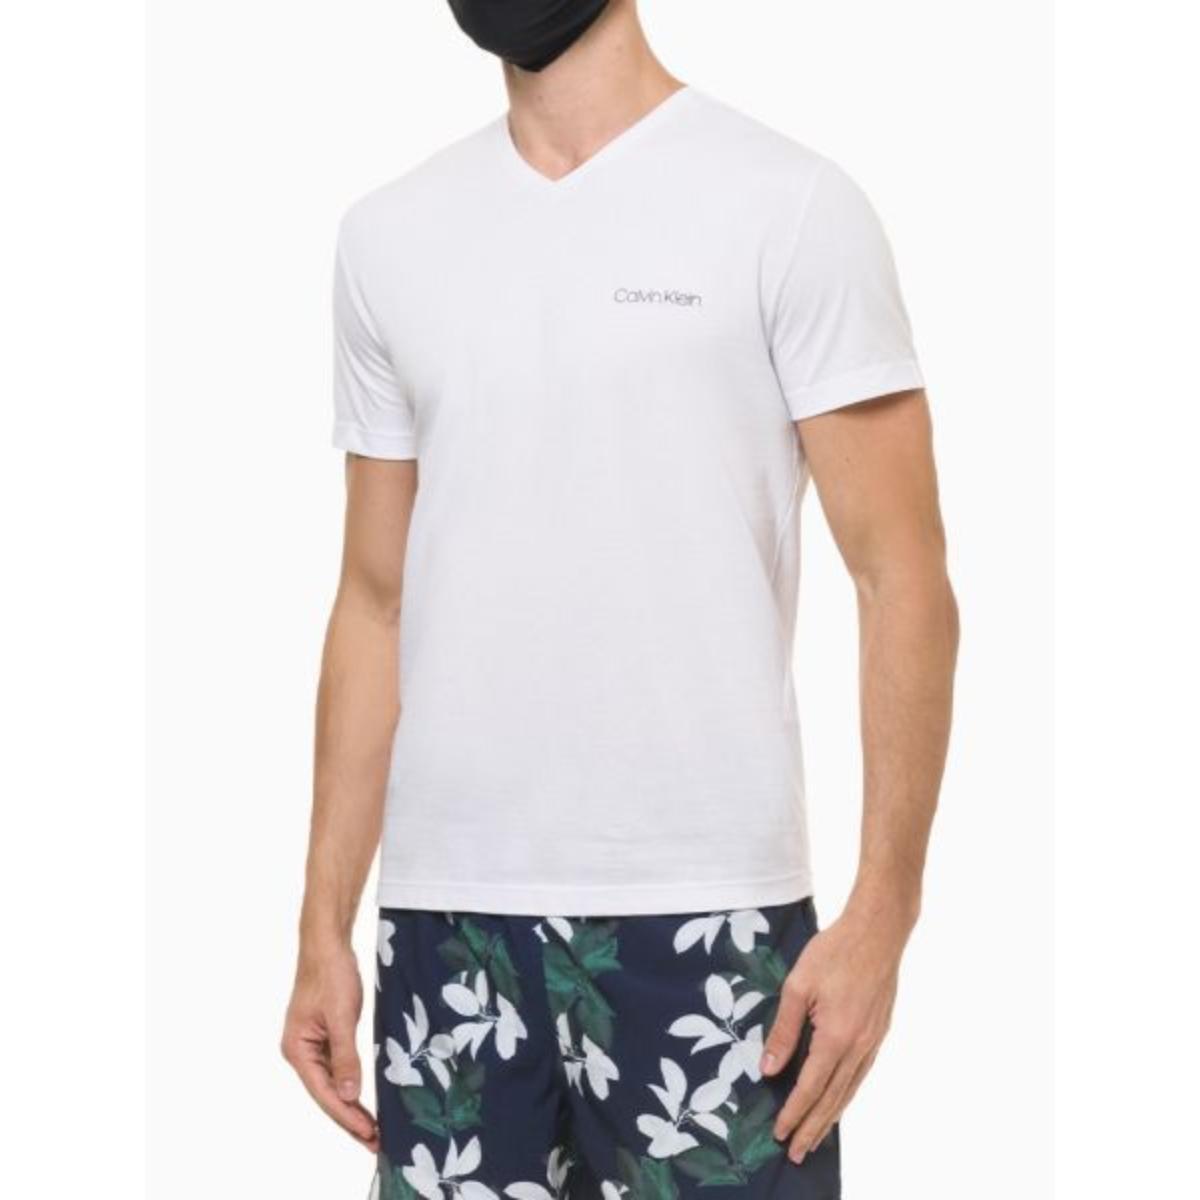 Camiseta Masculina Calvin Klein Cm1os01i3020 Branco